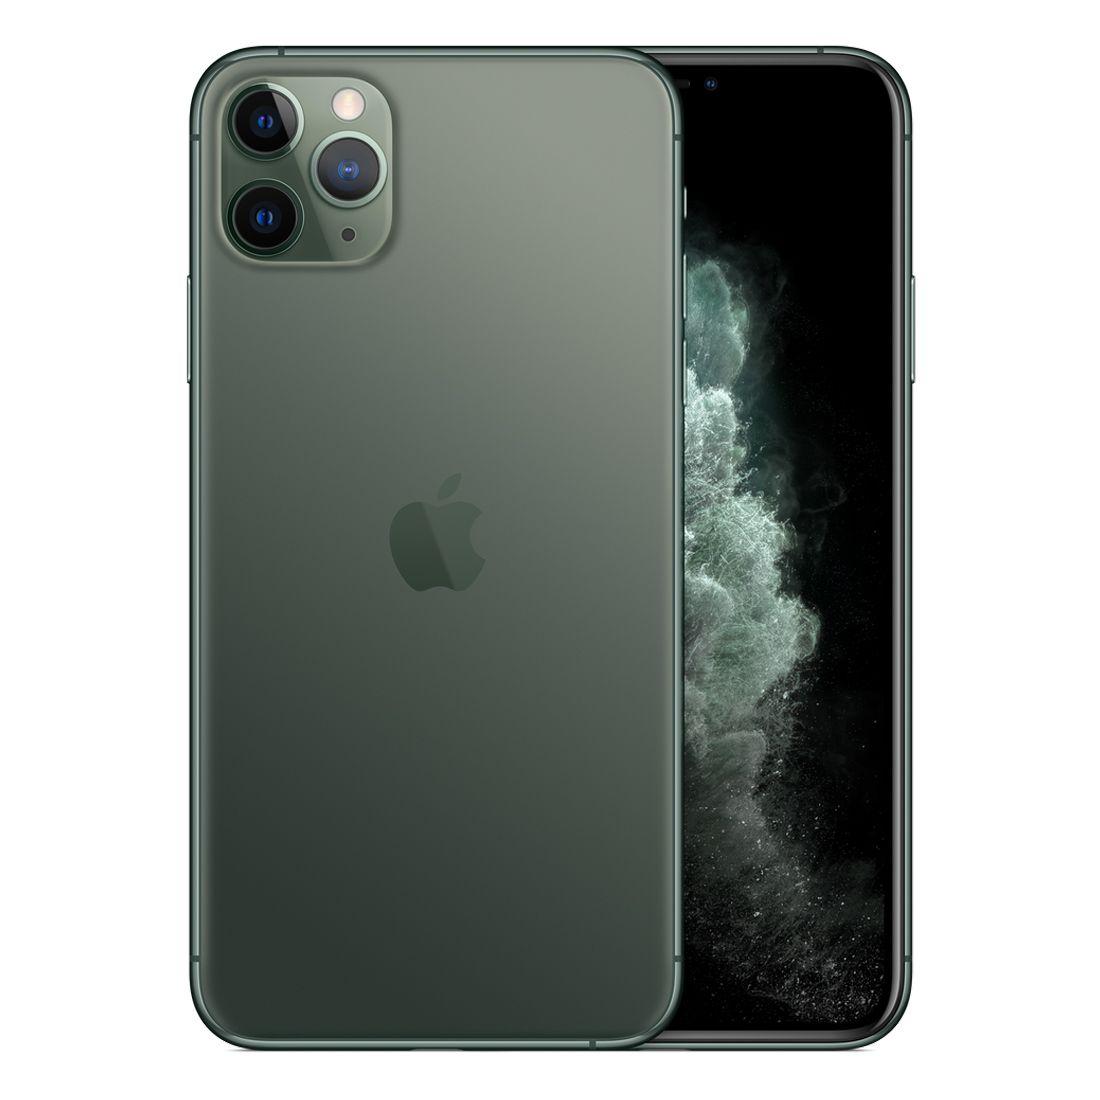 [Open Box - As New] Apple iPhone 11 Pro Max 64GB - Midnight Green